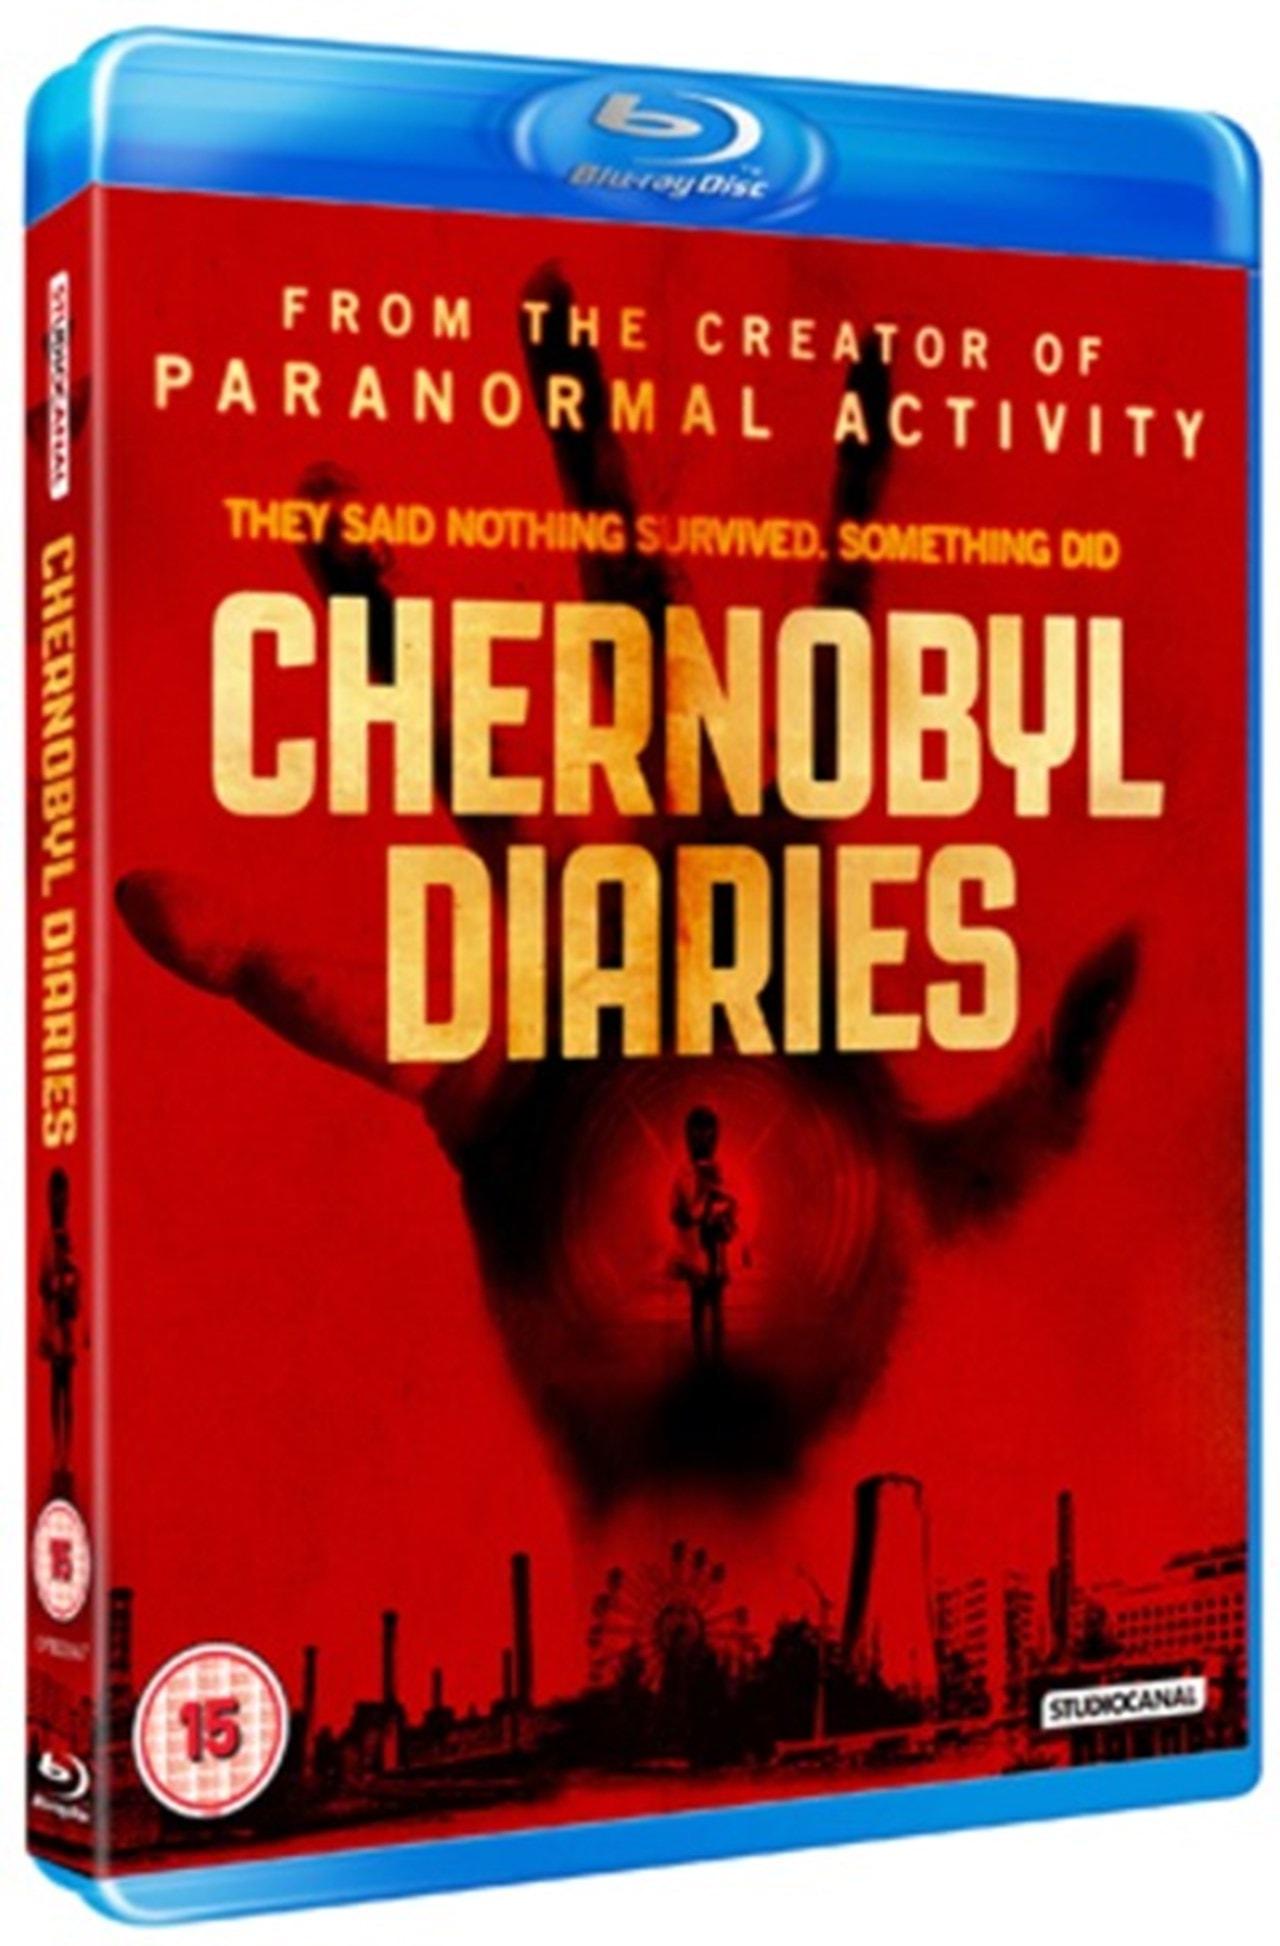 Chernobyl Diaries - 1